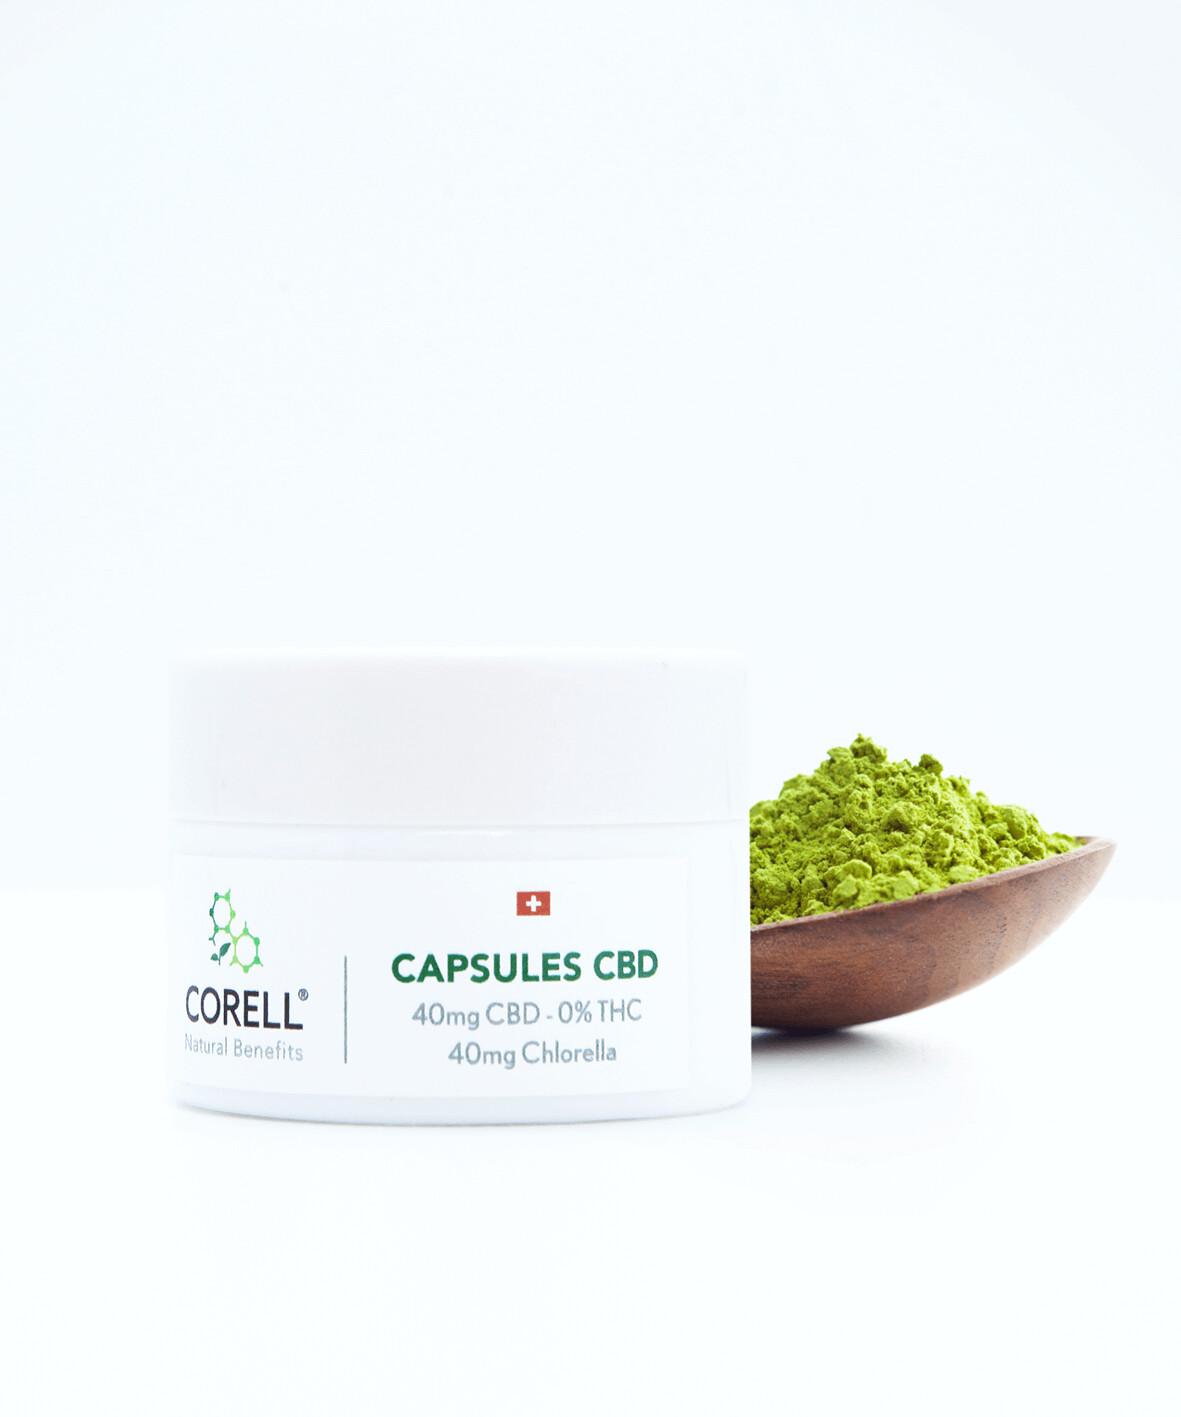 Corell - Capsules natural CBD et chlorella 40mg/ 20% CBD (30 capsules)